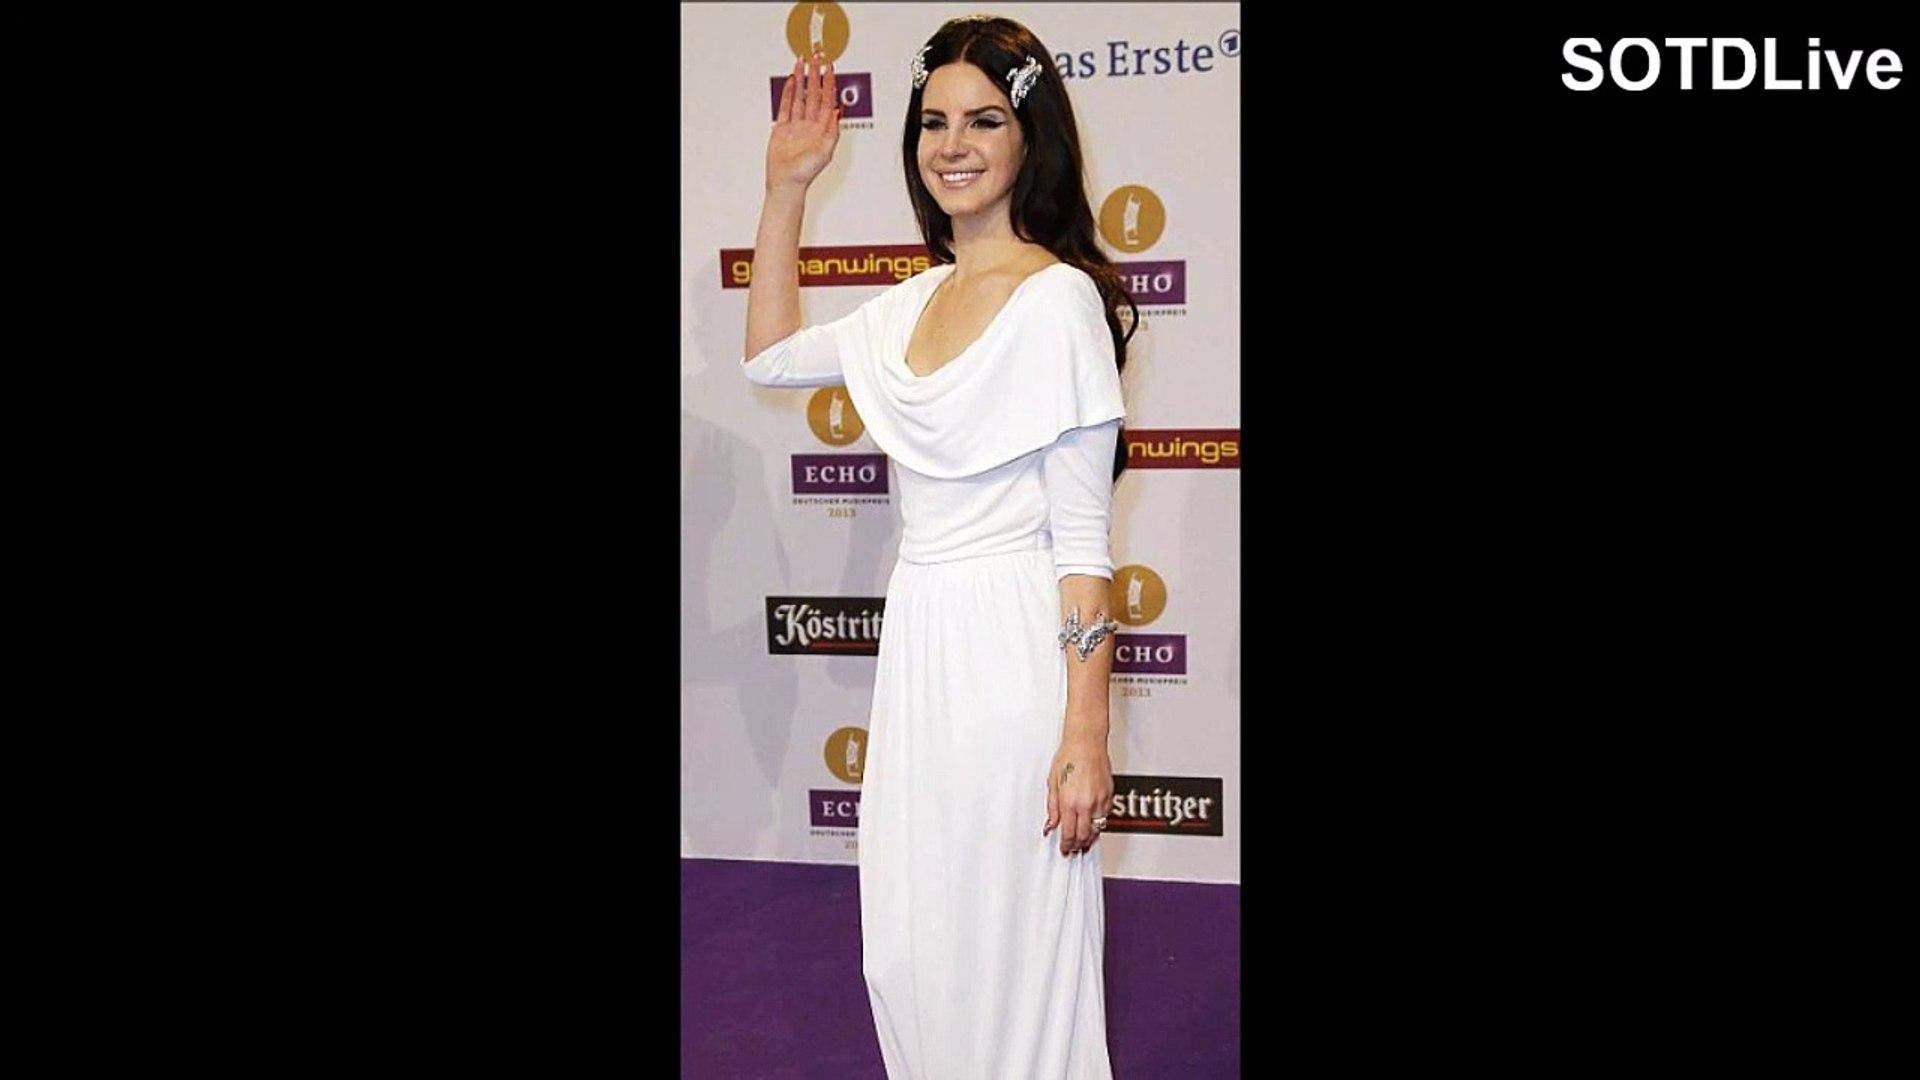 LANA DEL REY looks RAVISHING in WHITE DRESS | SOTDLive | Episode 3